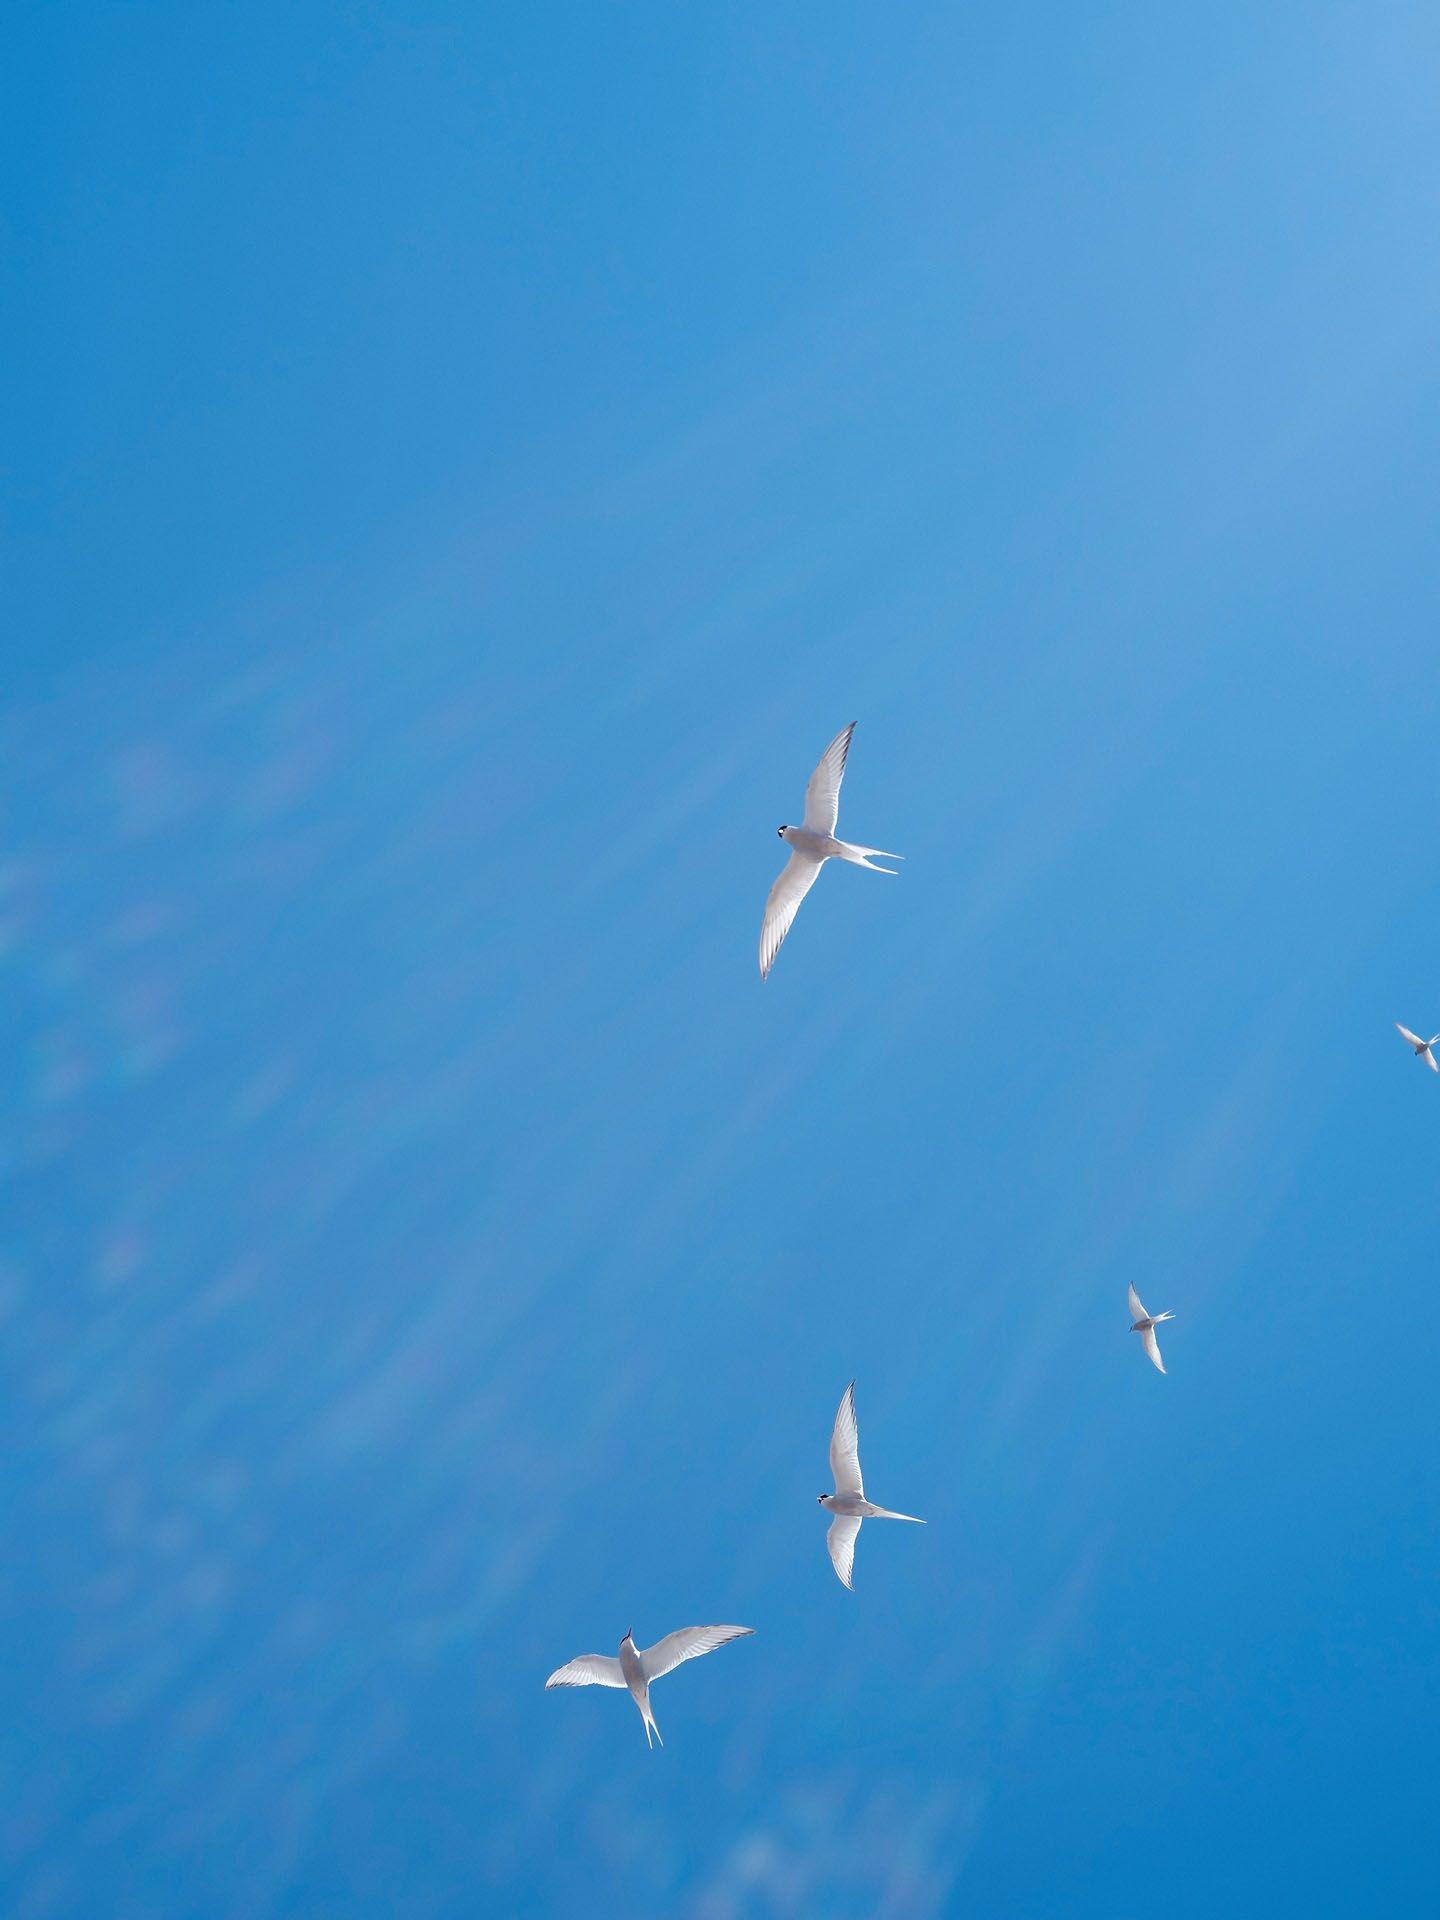 white birds flying in blue sky by Guillaume Simoneau in Saint-Pierre-et-Miquelon for M le mag Le Monde